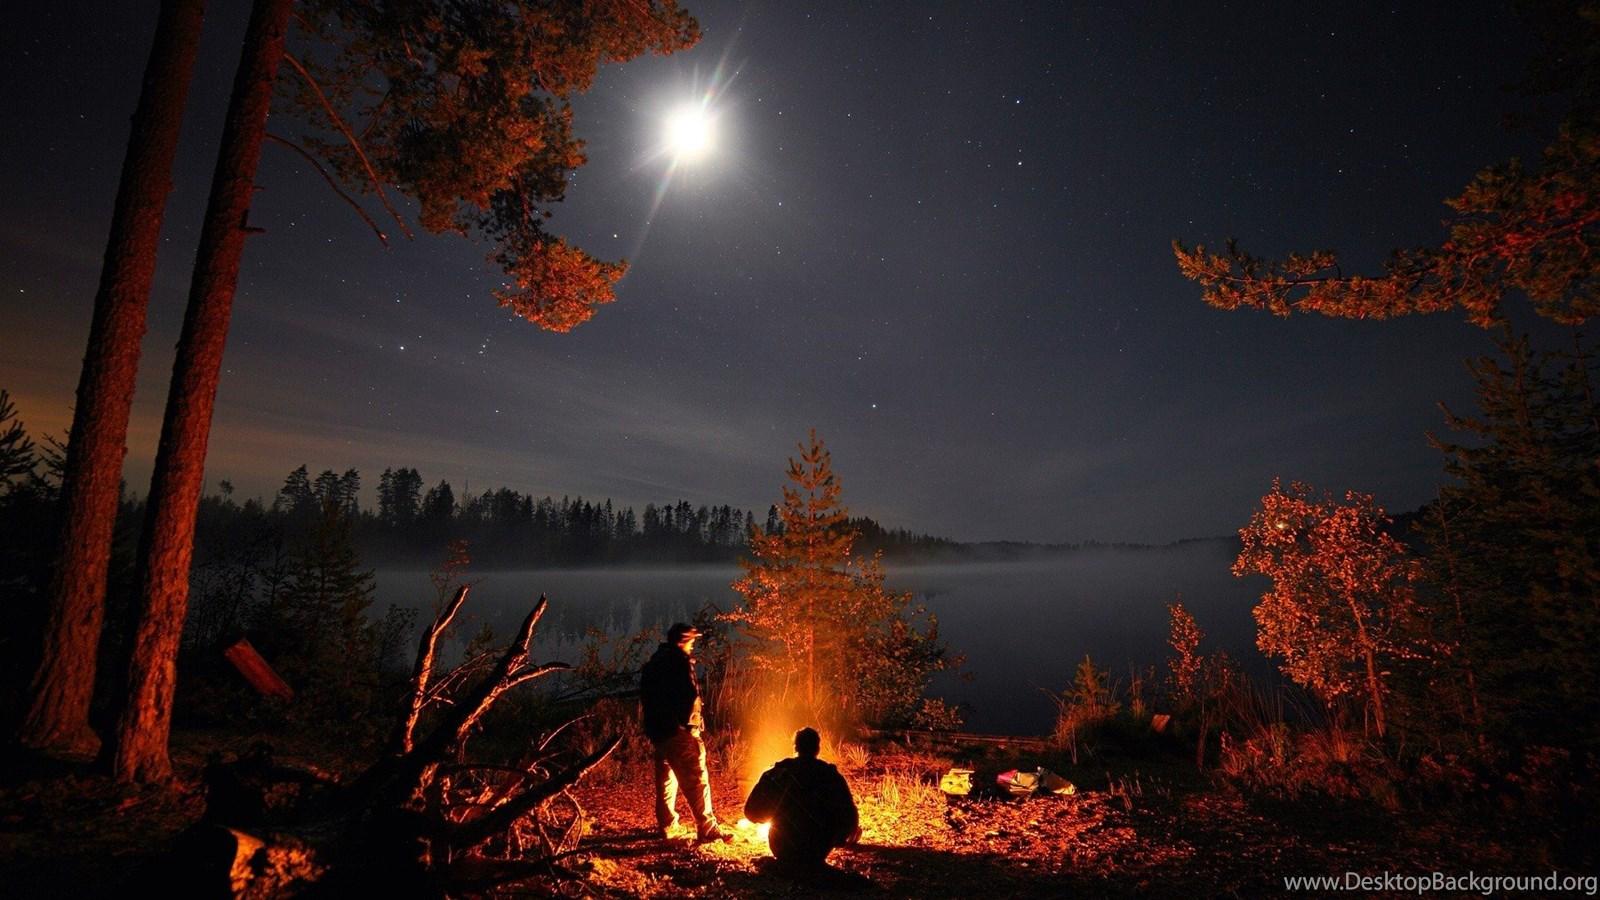 Landscape Lake Pine Trees Camping Wallpapers Hd Desktop And Desktop Background